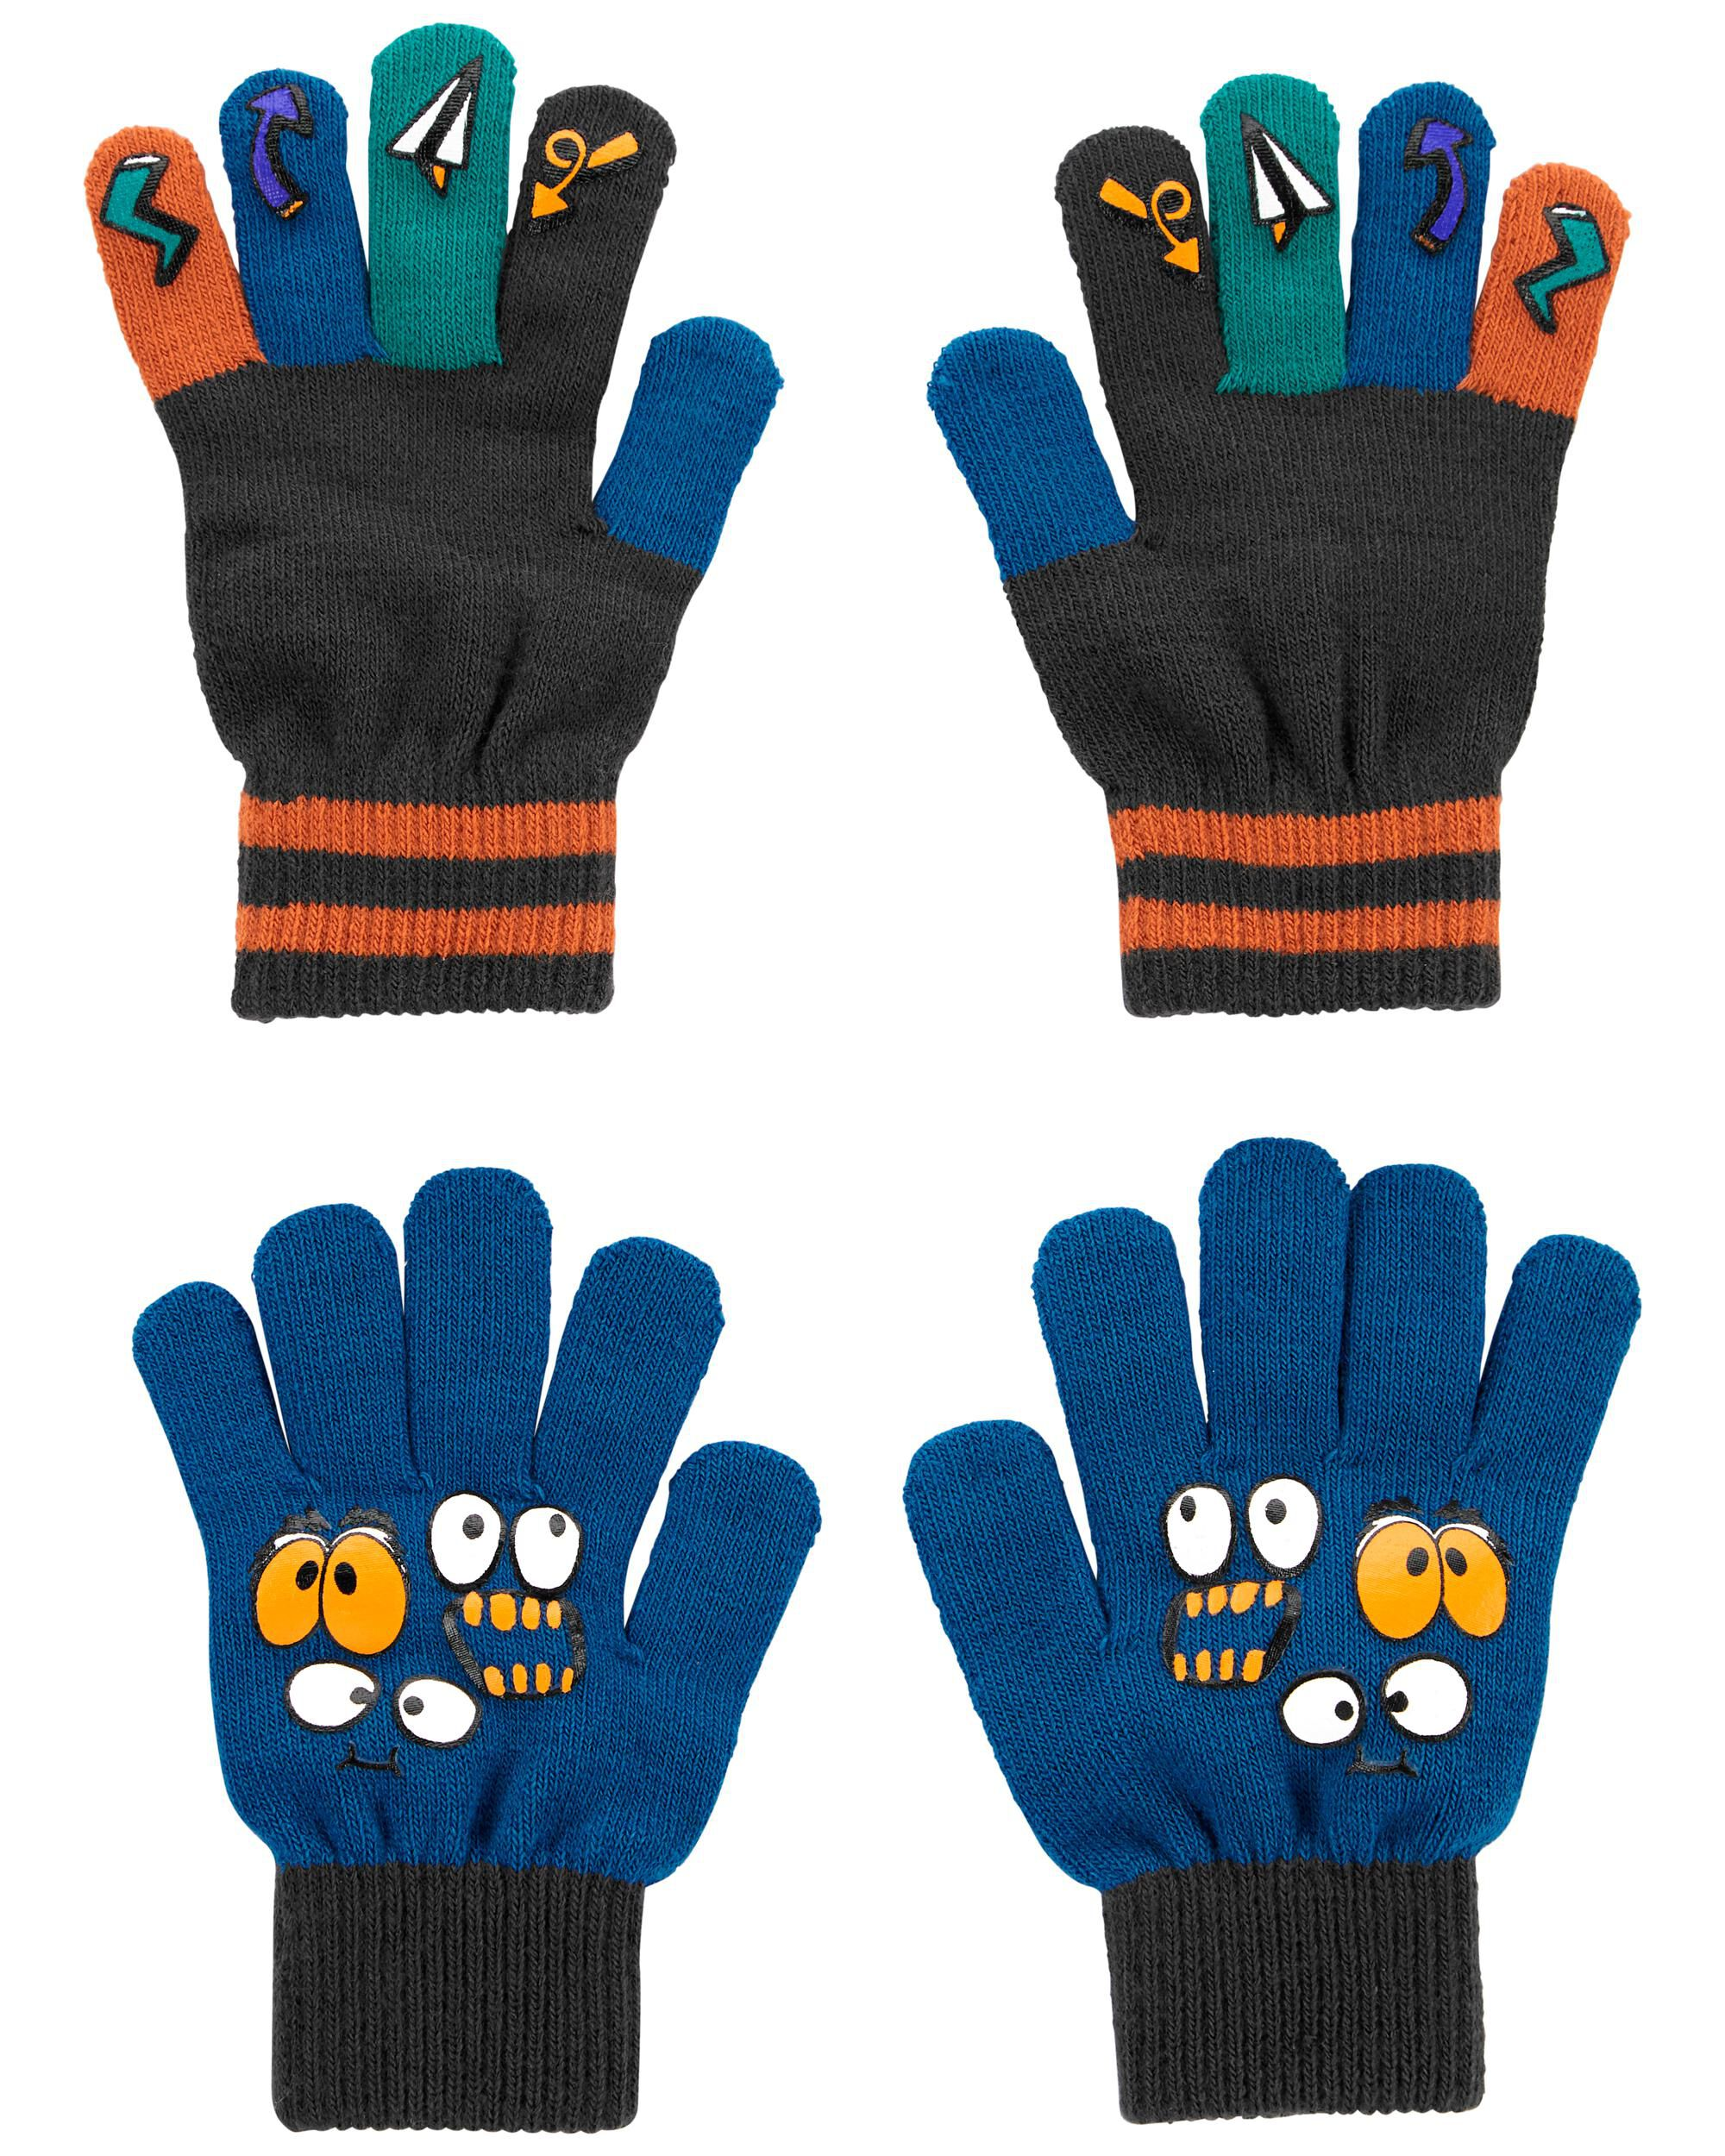 *DOORBUSTER*2-Pack Gripper Gloves